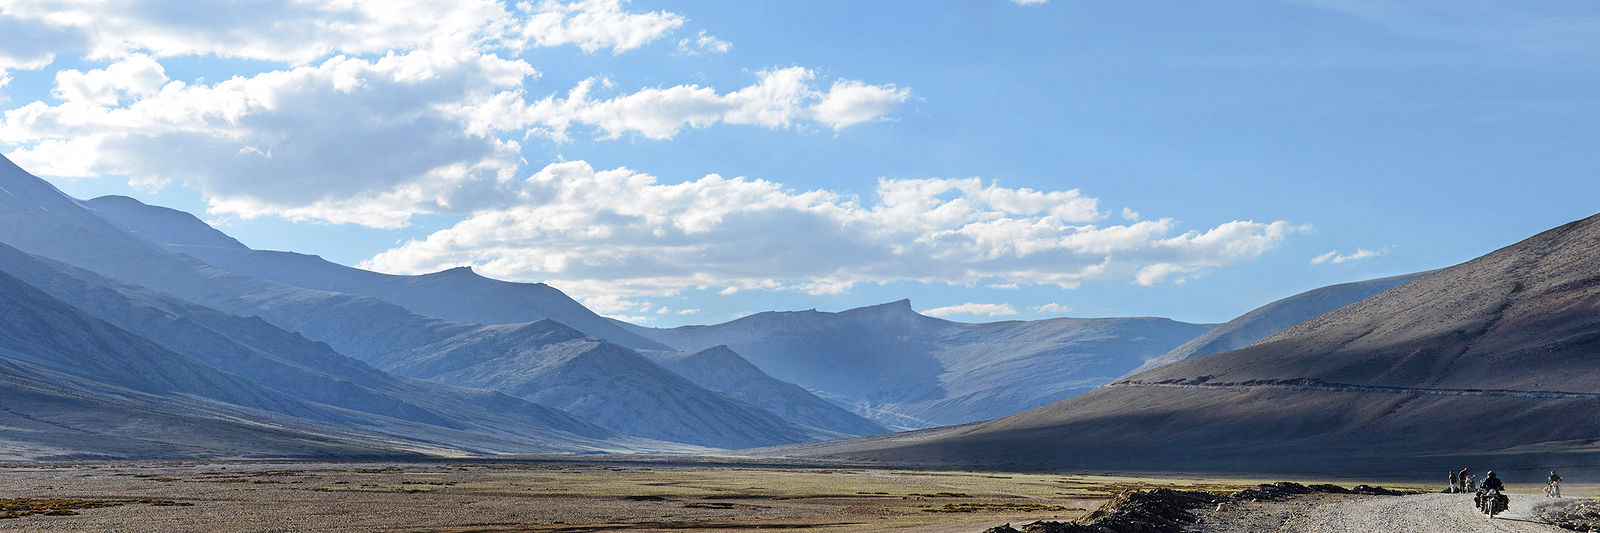 Ivan Aleshin. NH21 and other Himalayan Roads. 0000